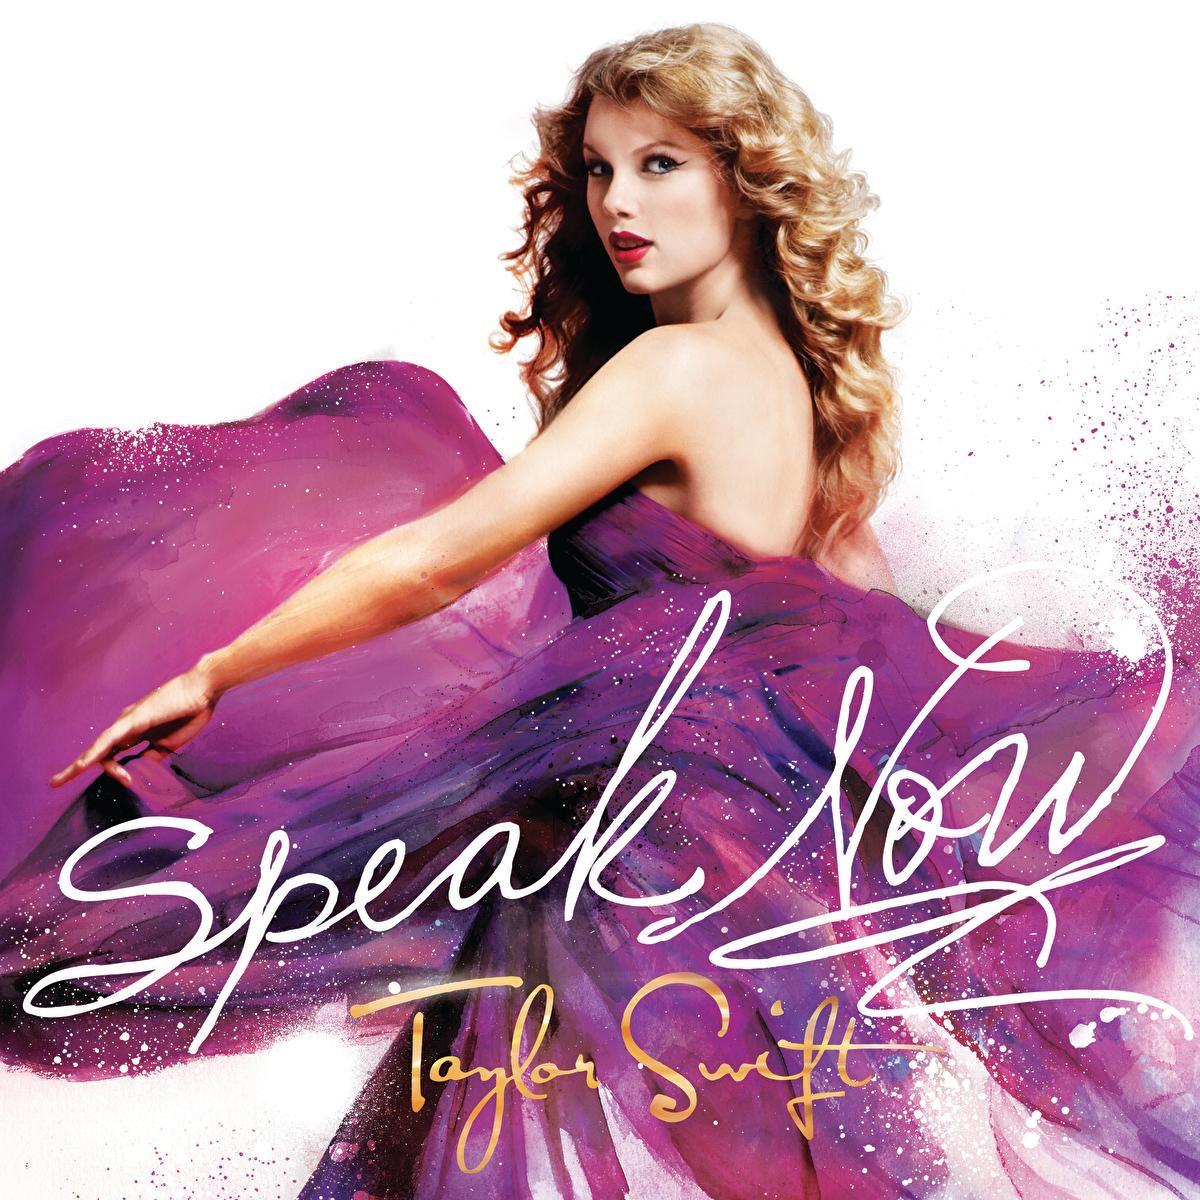 Speak Now Taylor Swift CD cover